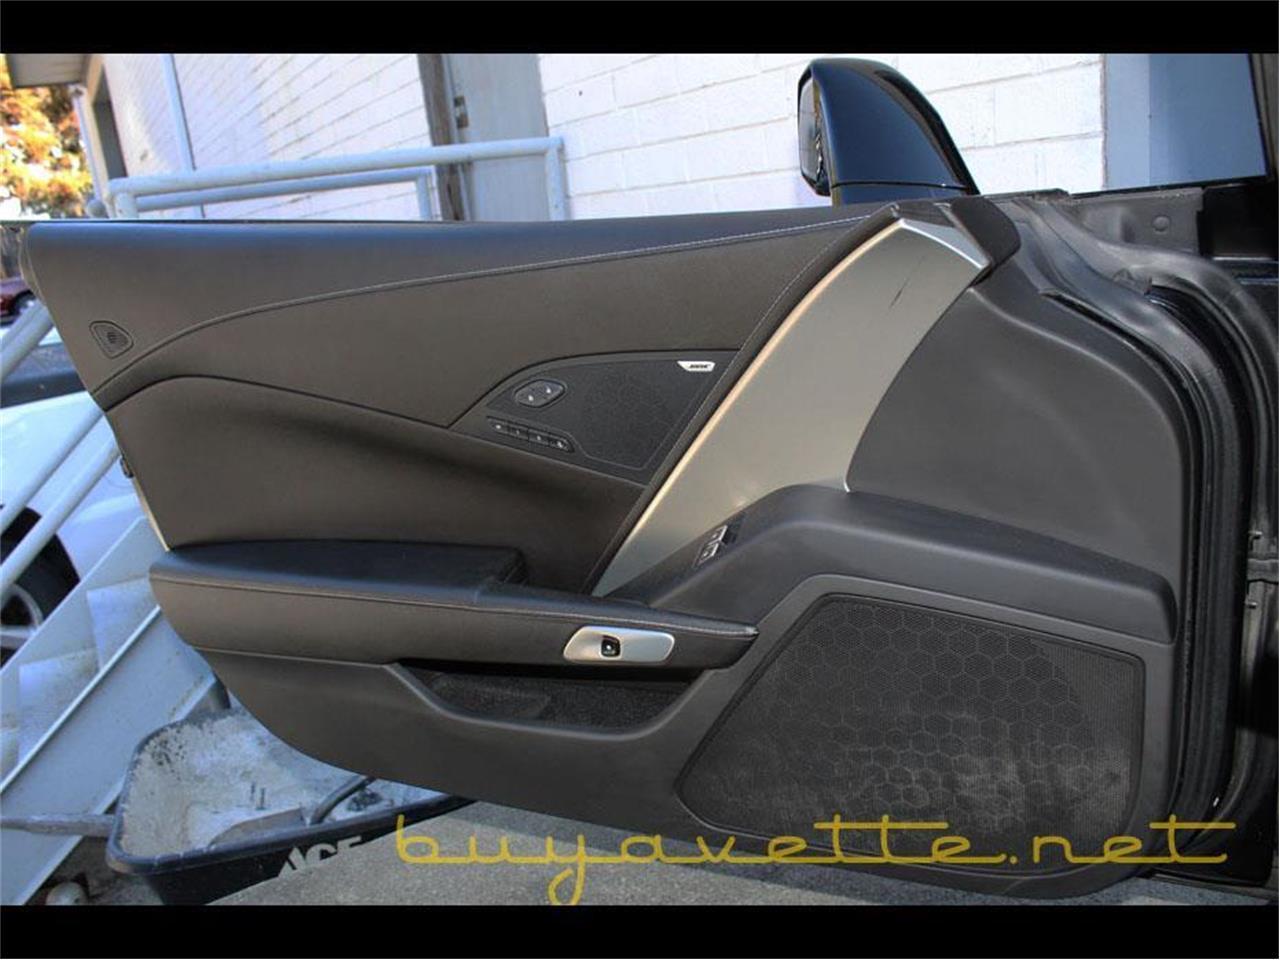 2016 Chevrolet Corvette (CC-1297362) for sale in Atlanta, Georgia